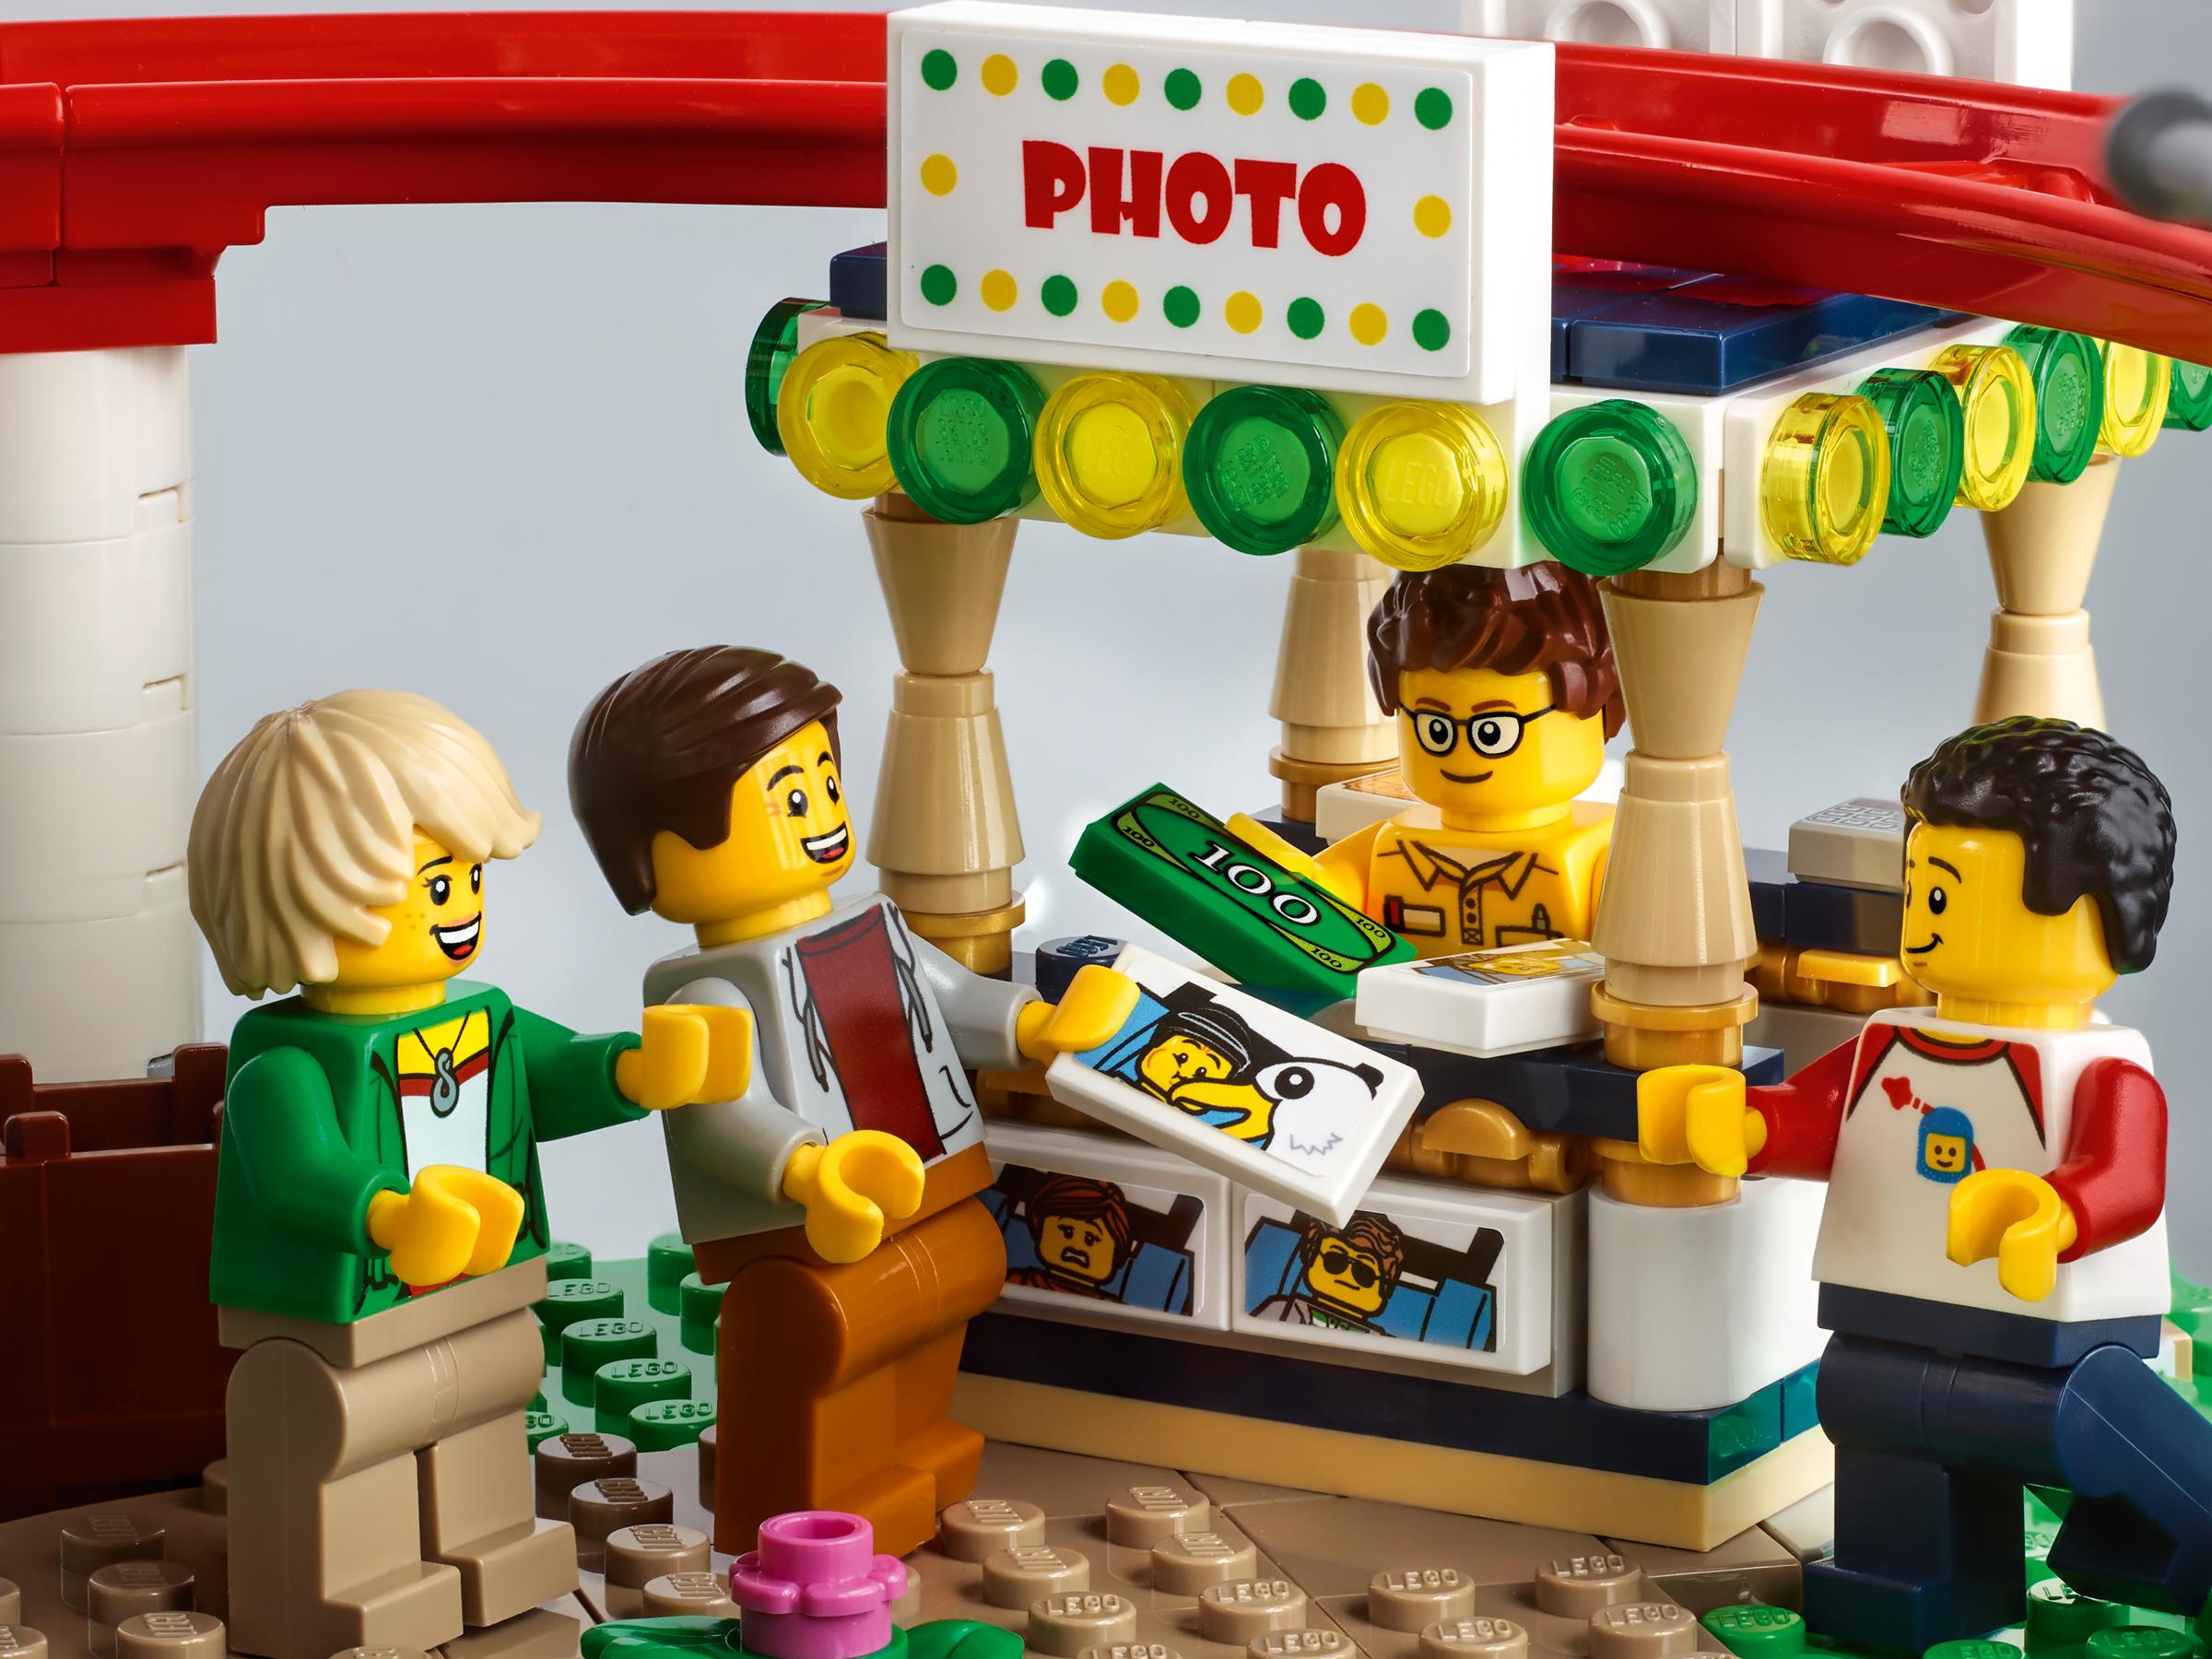 10261 lego creator expert roller coaster photo booth. Black Bedroom Furniture Sets. Home Design Ideas